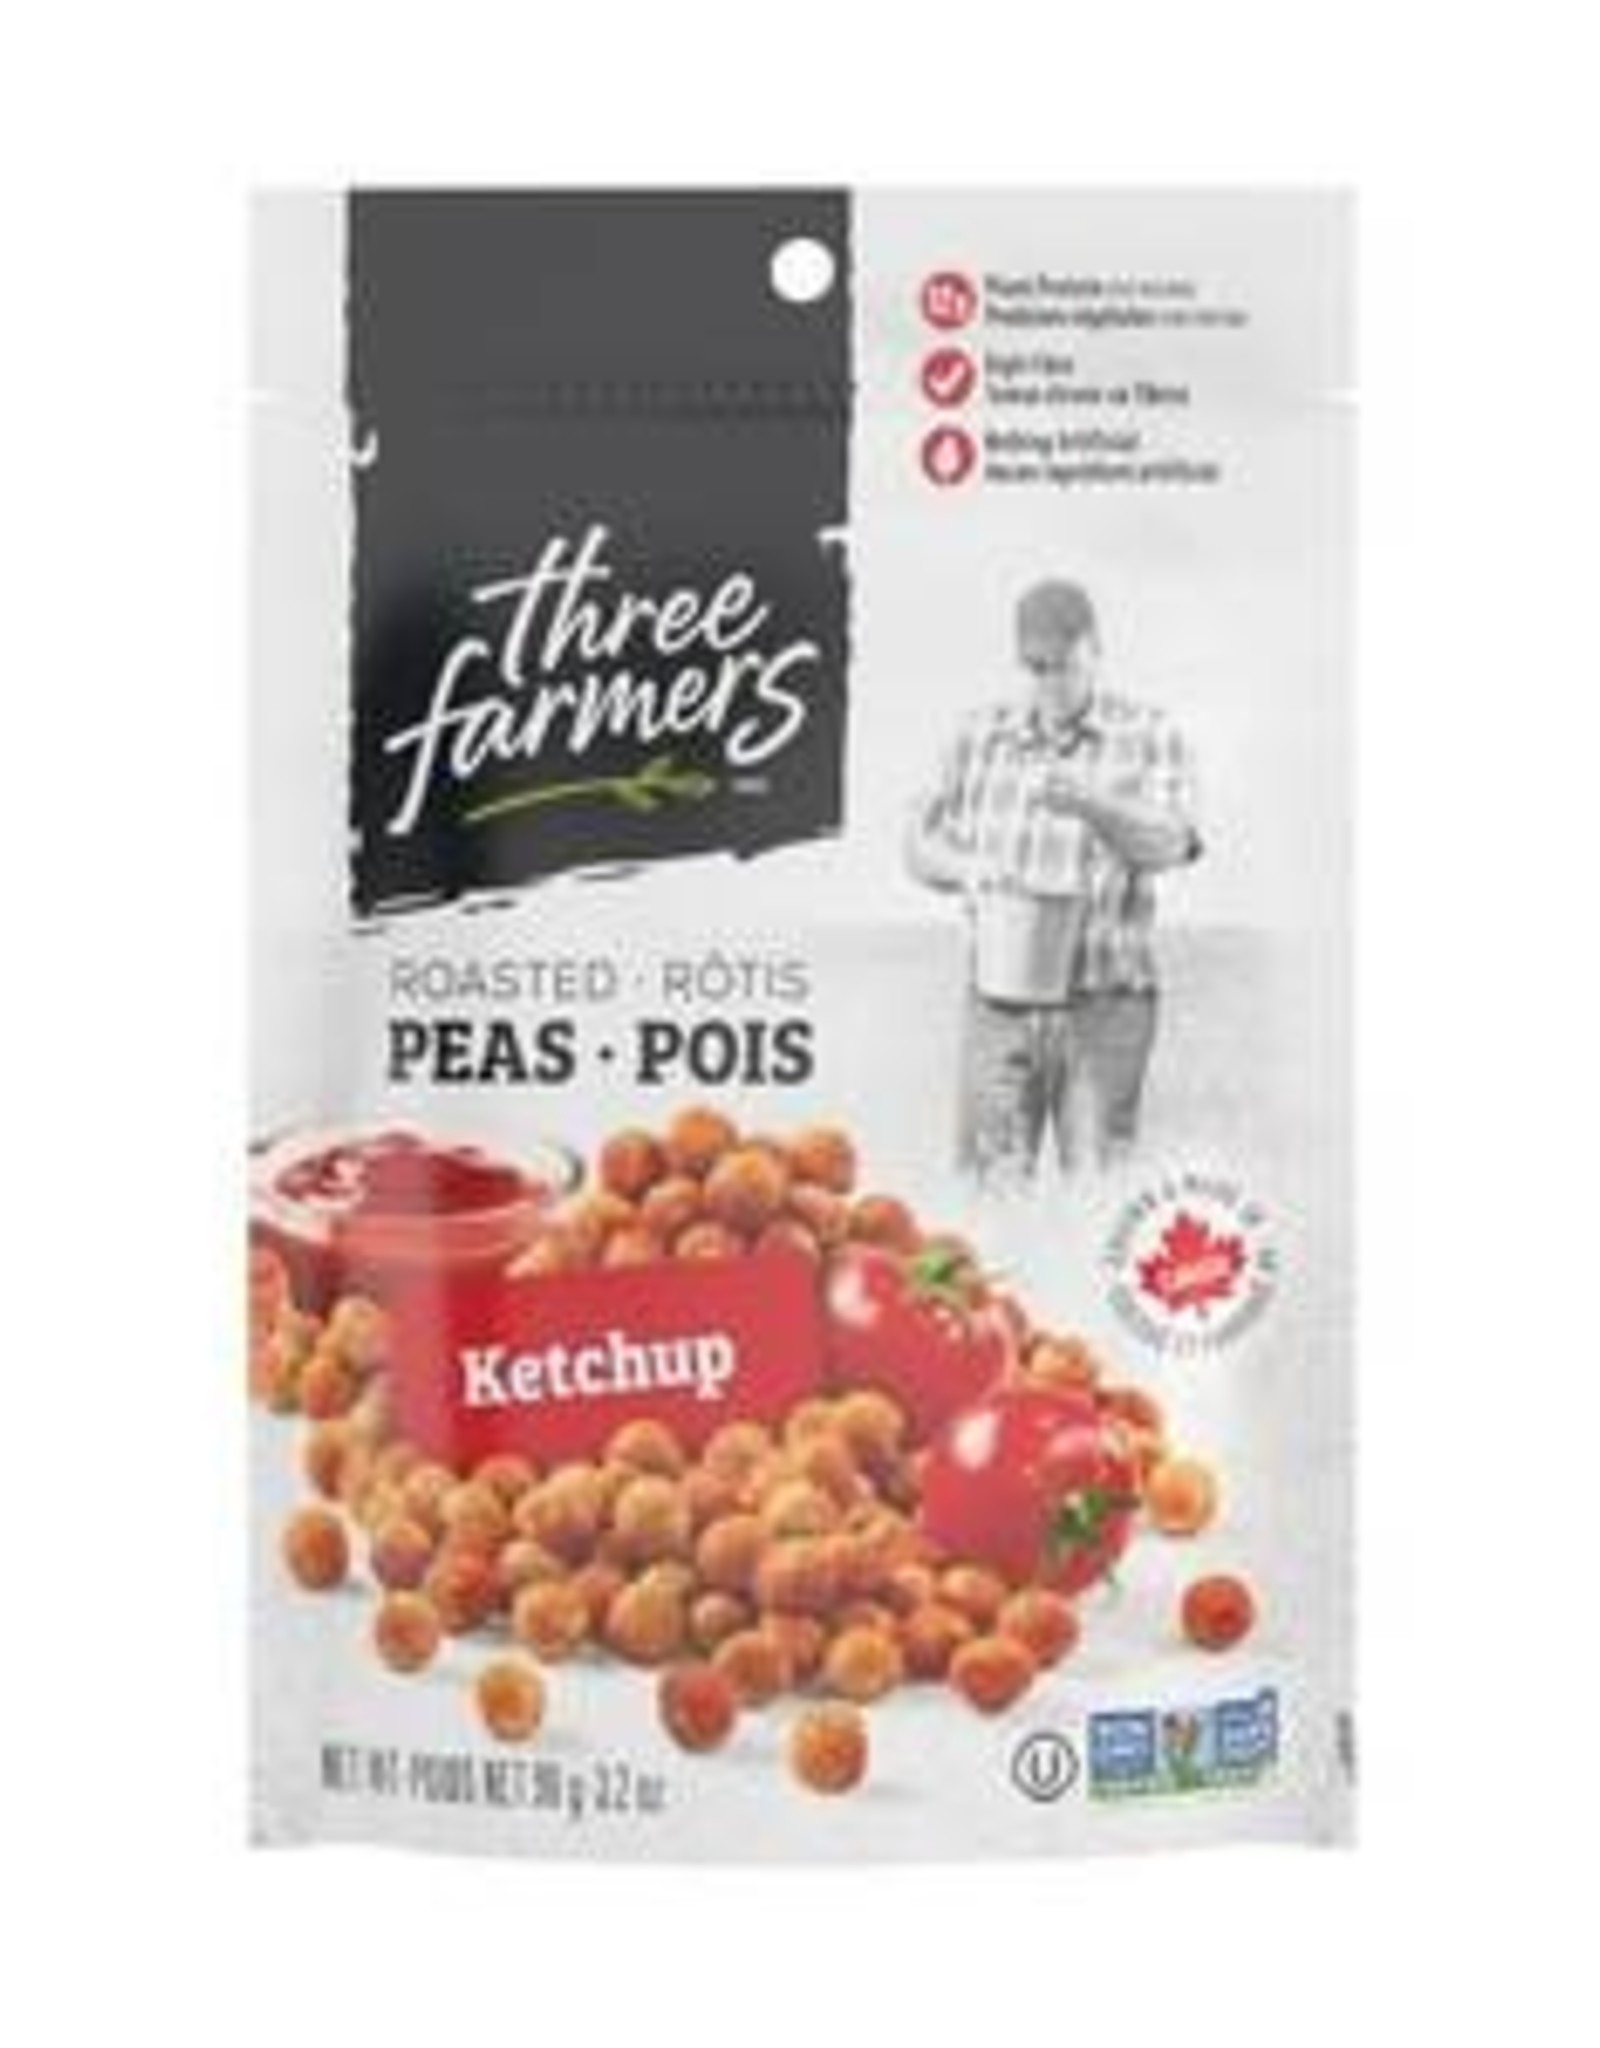 Three Farmers Three Farmers - Pois Rôtis, Ketchup (90g)